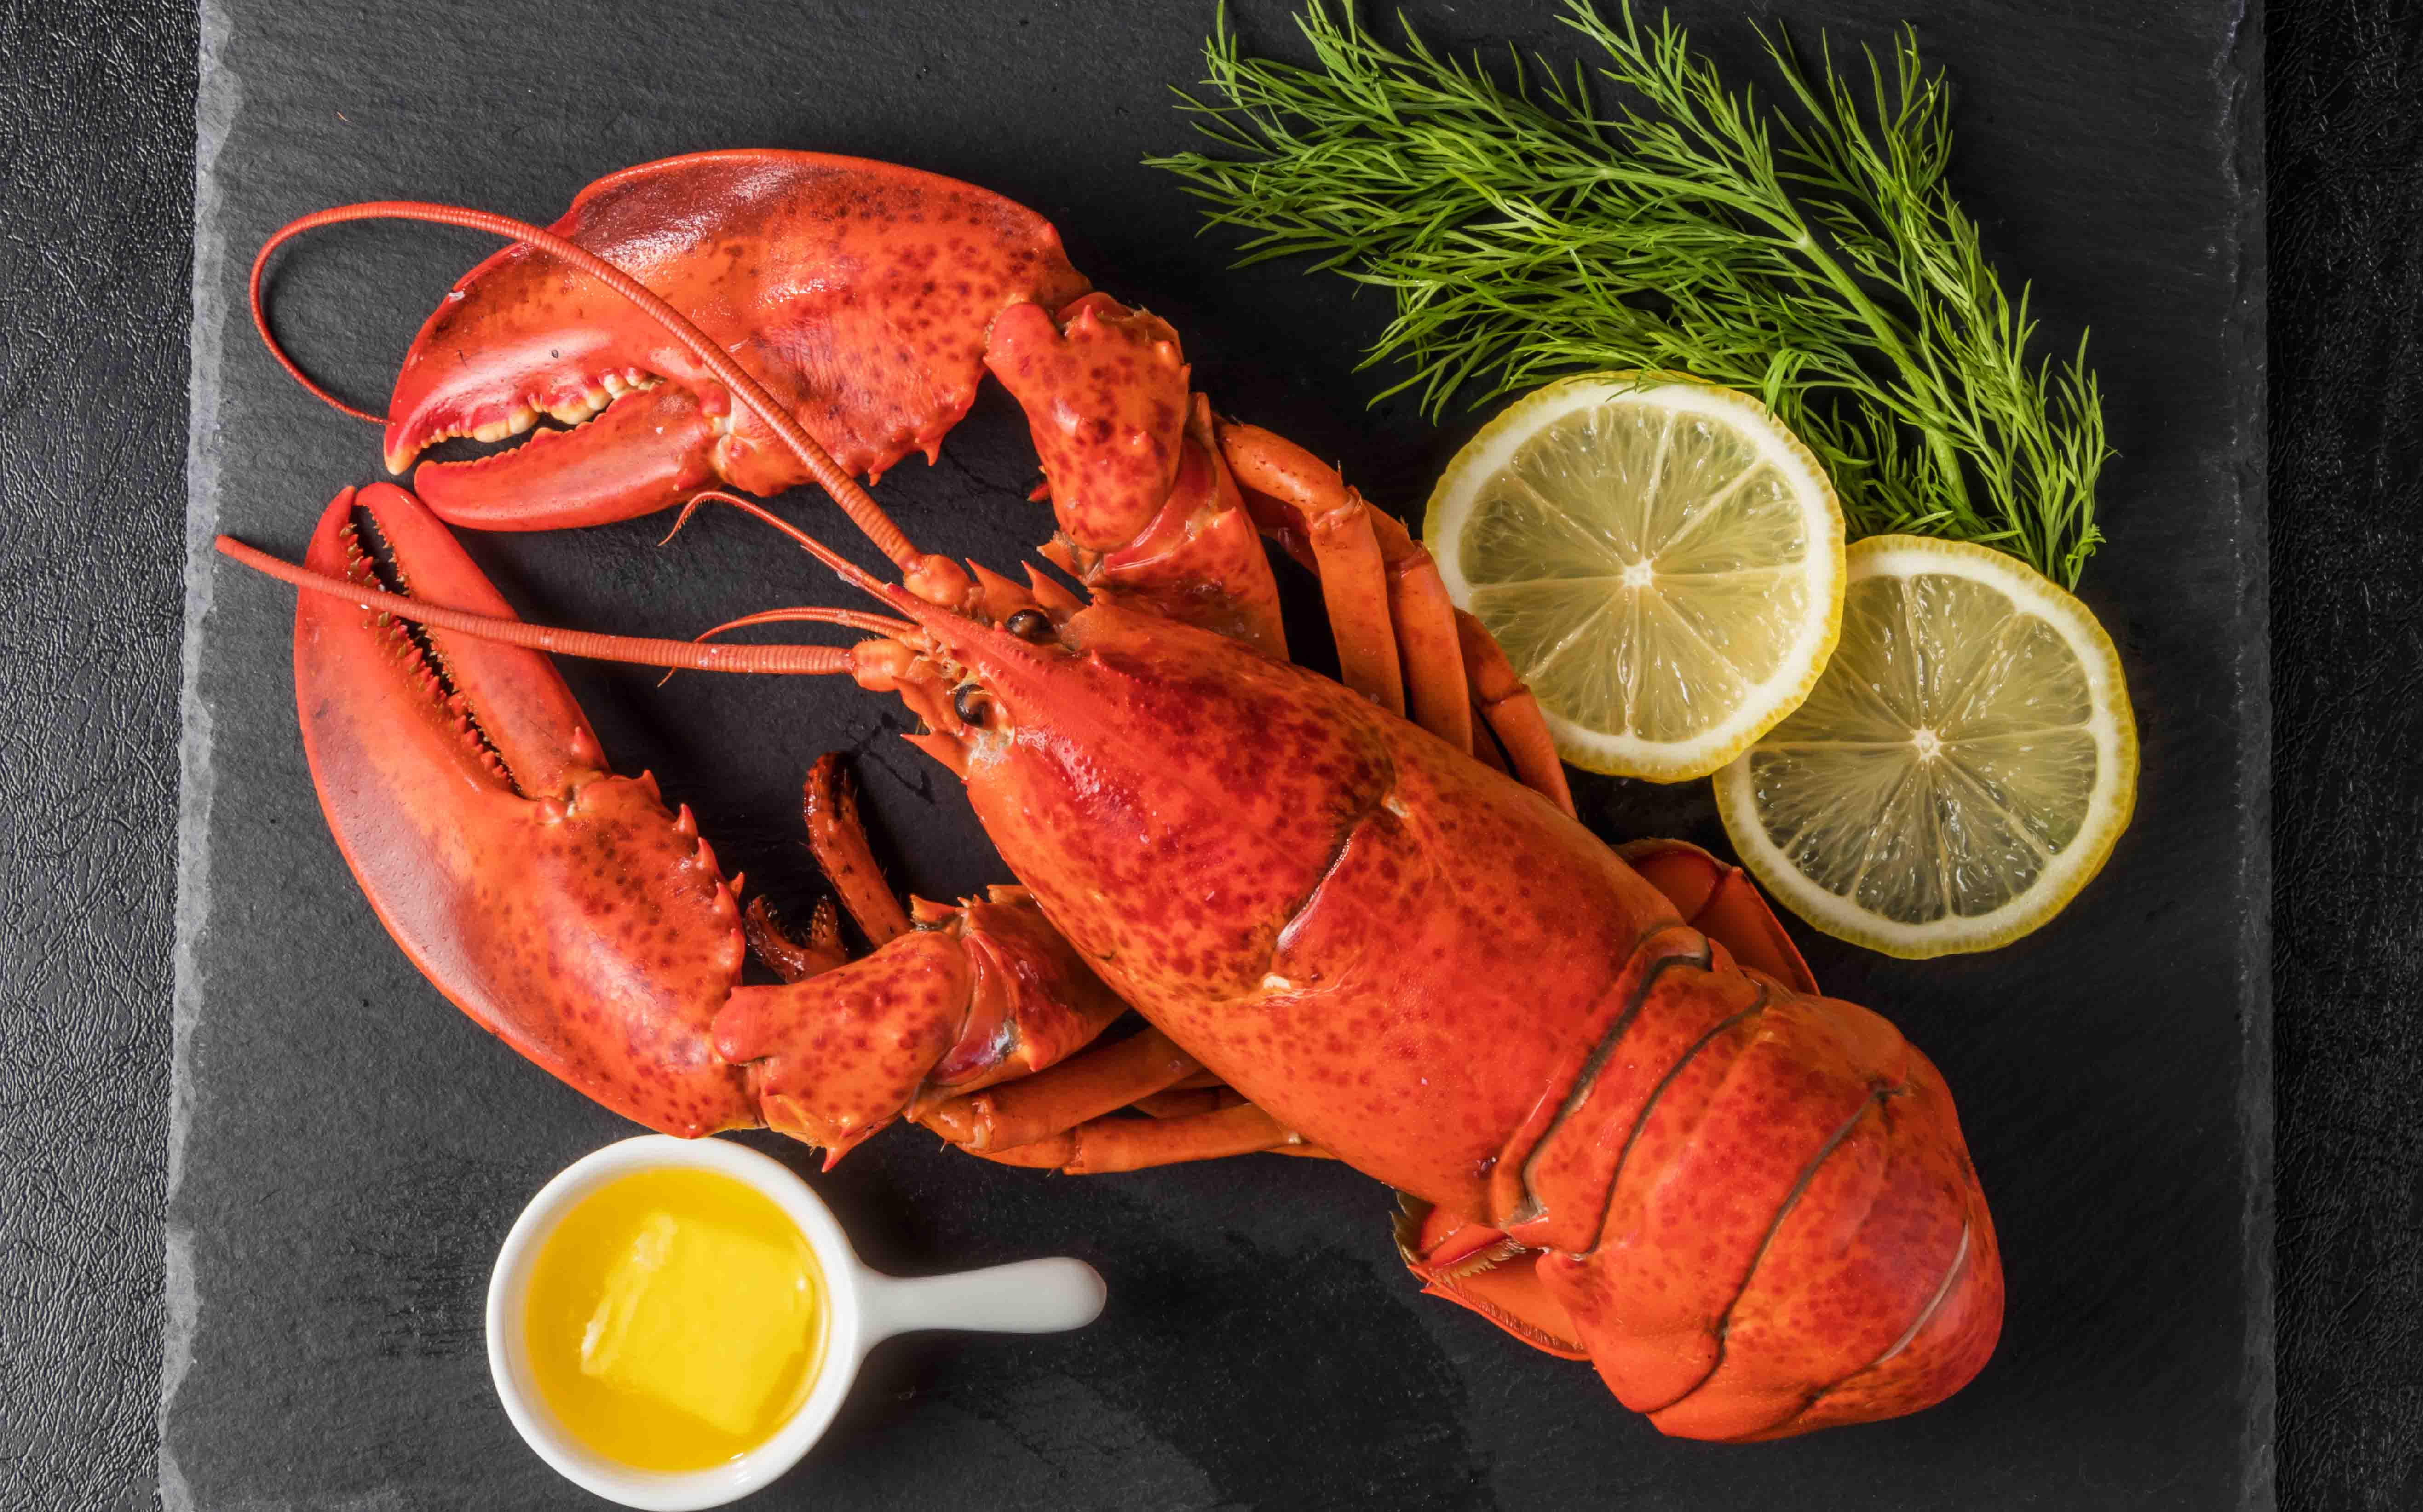 aragosta-benefici-cucina-eoliana-ristorante-filippino-lipari.jpg